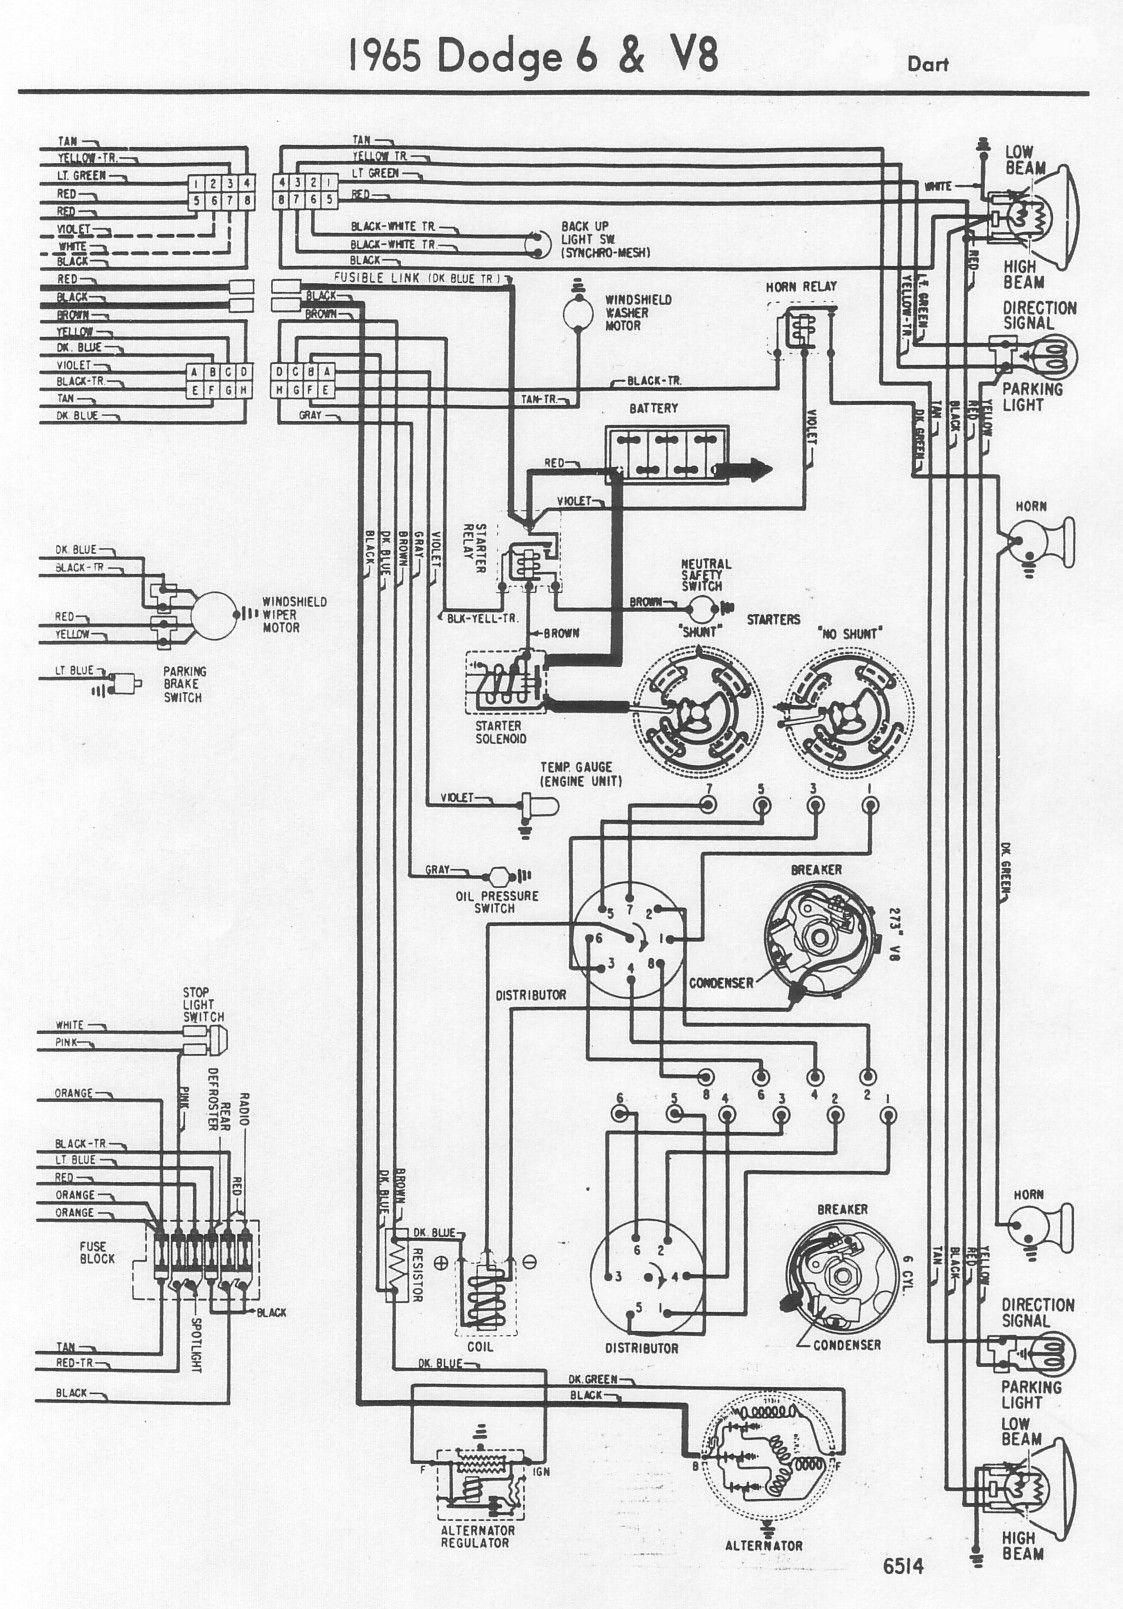 65 dodge coronet wiring diagram wiring diagram